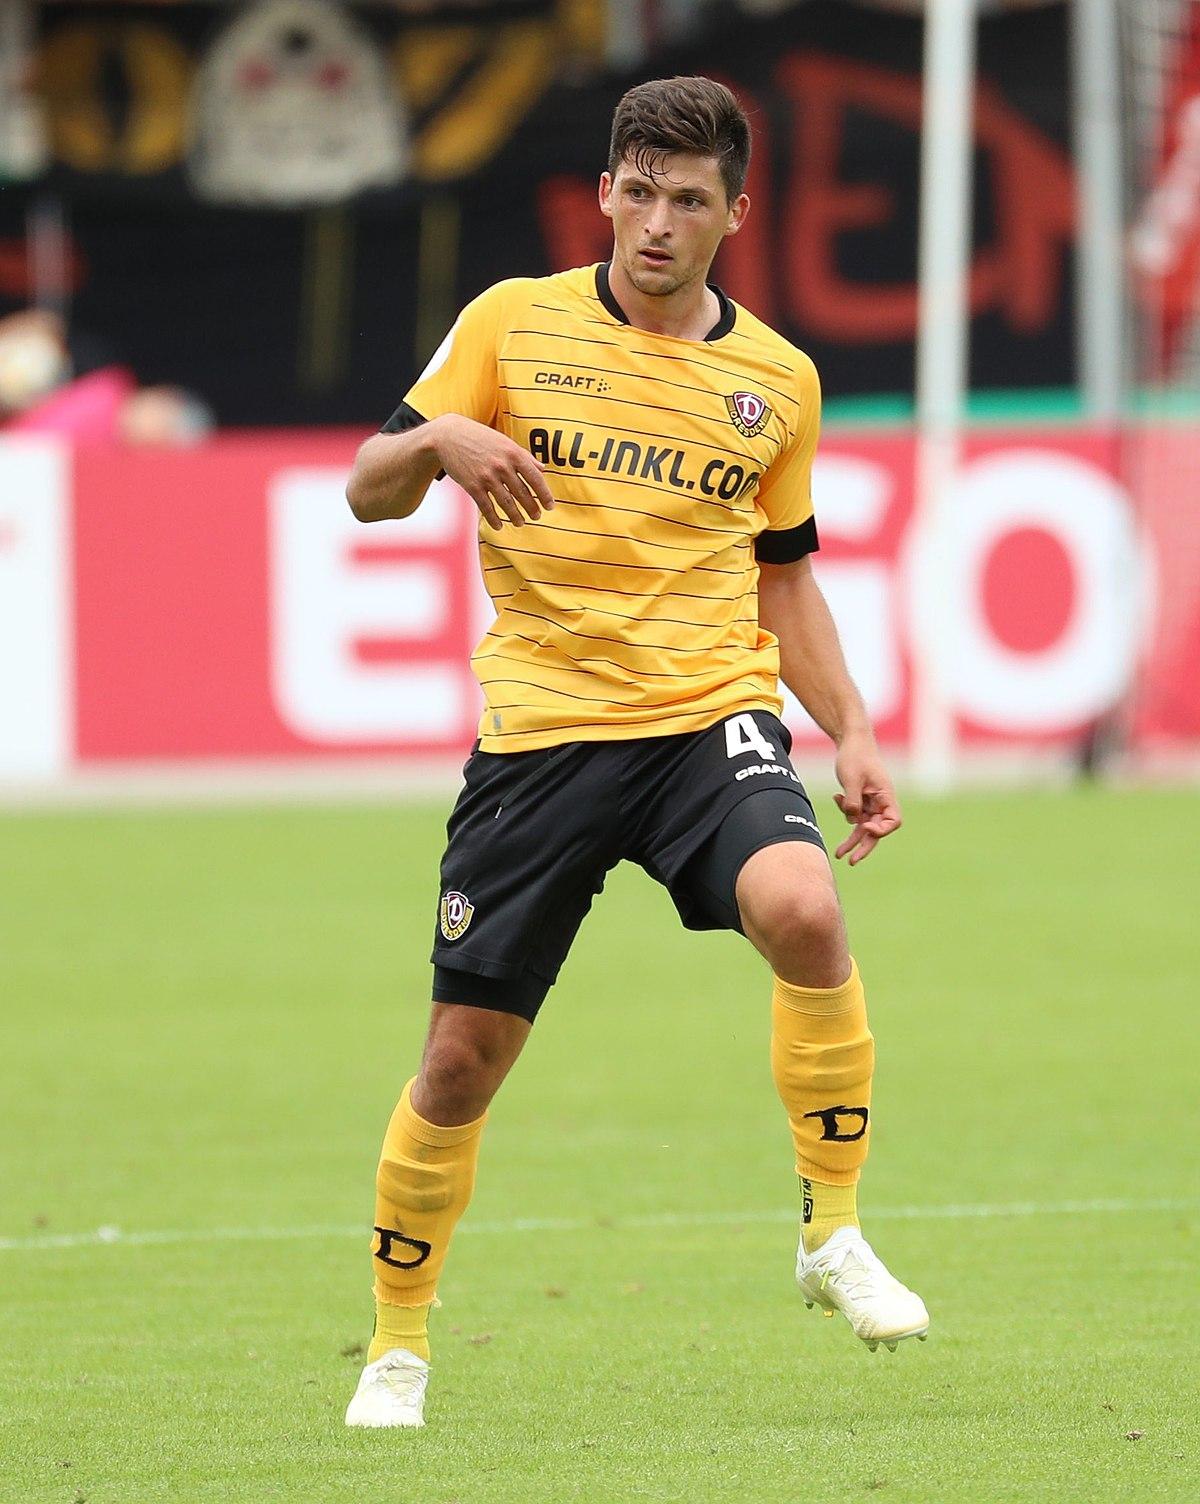 Würzburger Kickers Dynamo Dresden